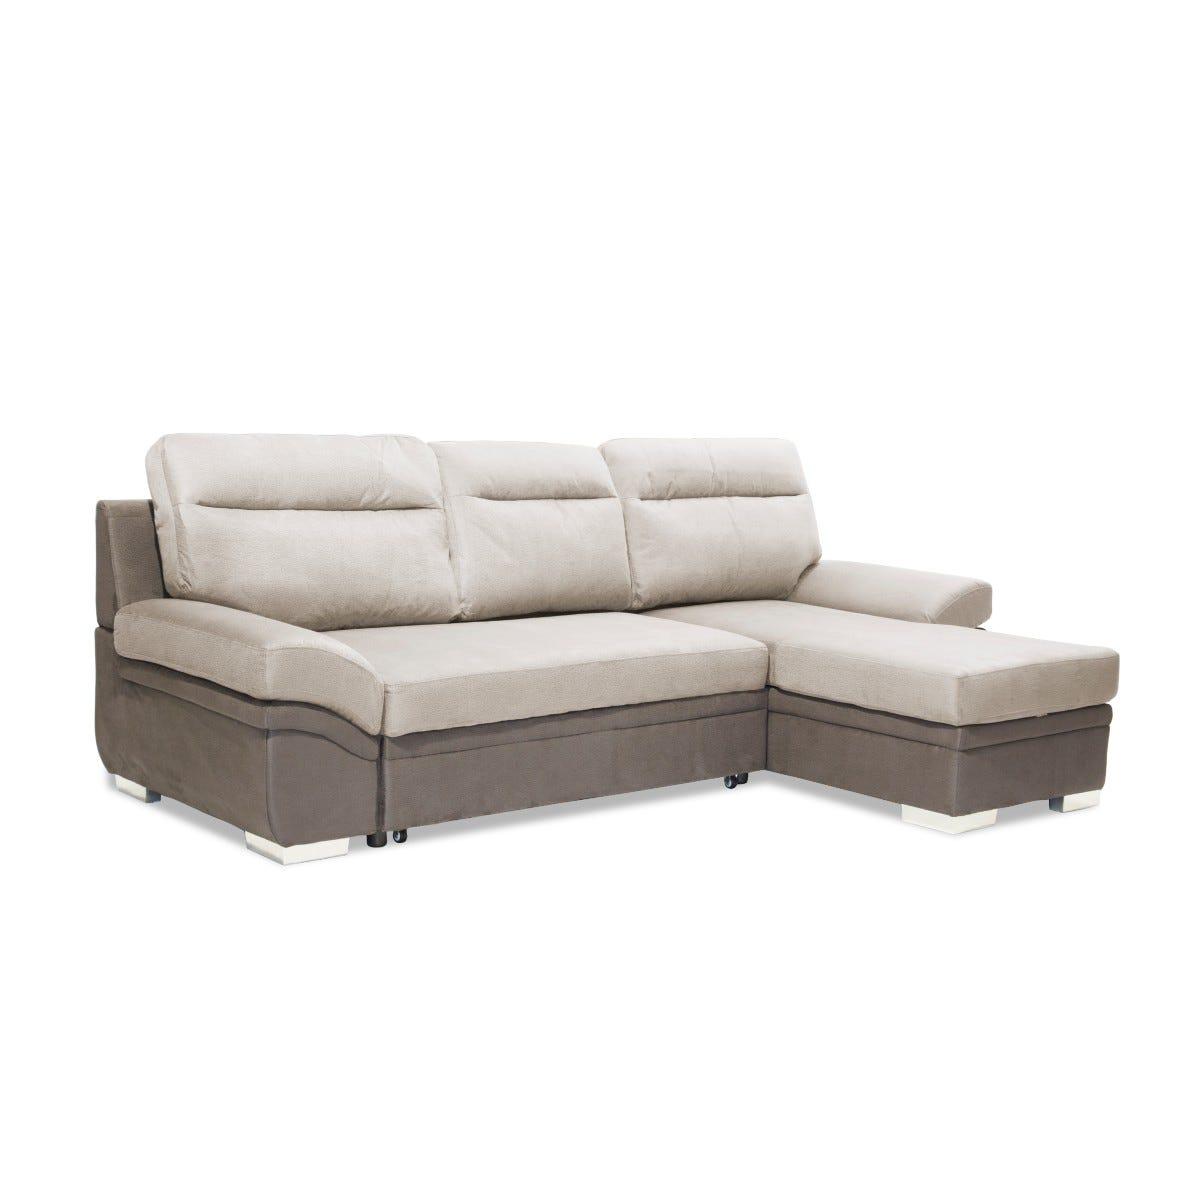 Jarrow Corner Chaise Sofa Bed With Storage